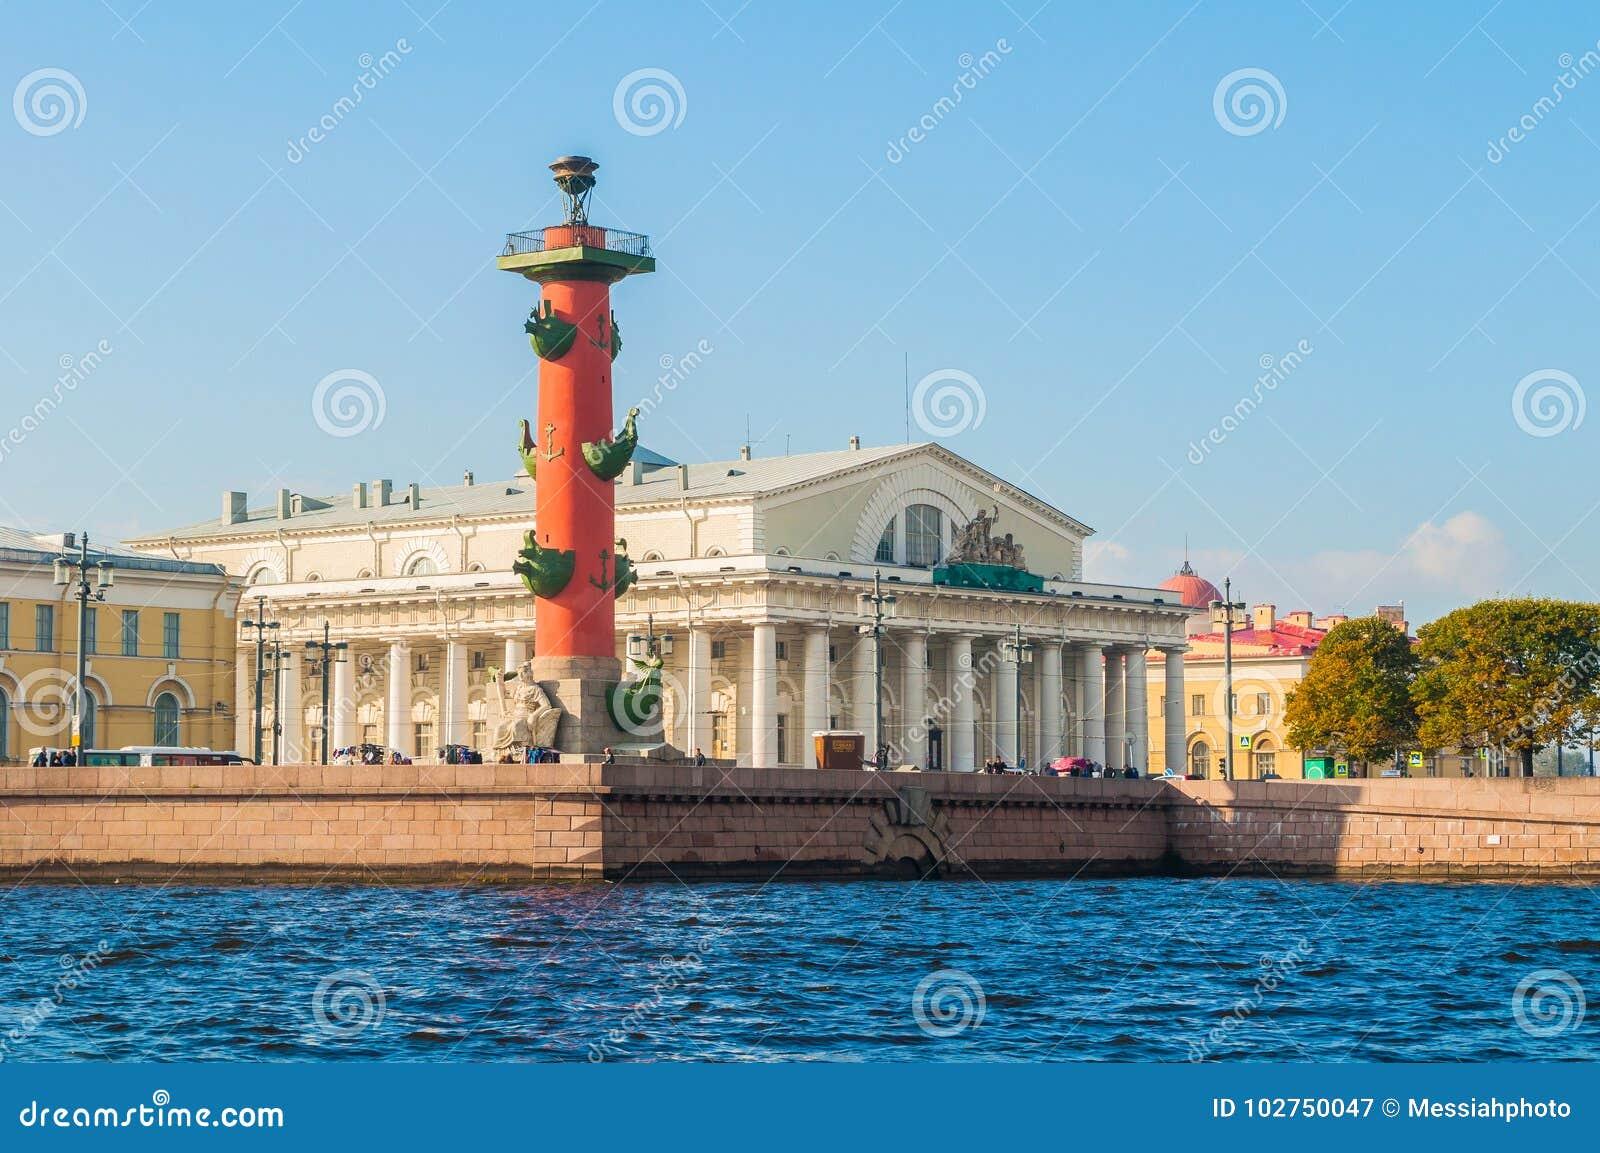 St Petersburg Russia landmarks of Vasilievsky island spit. Rostral column and old stock exchange building